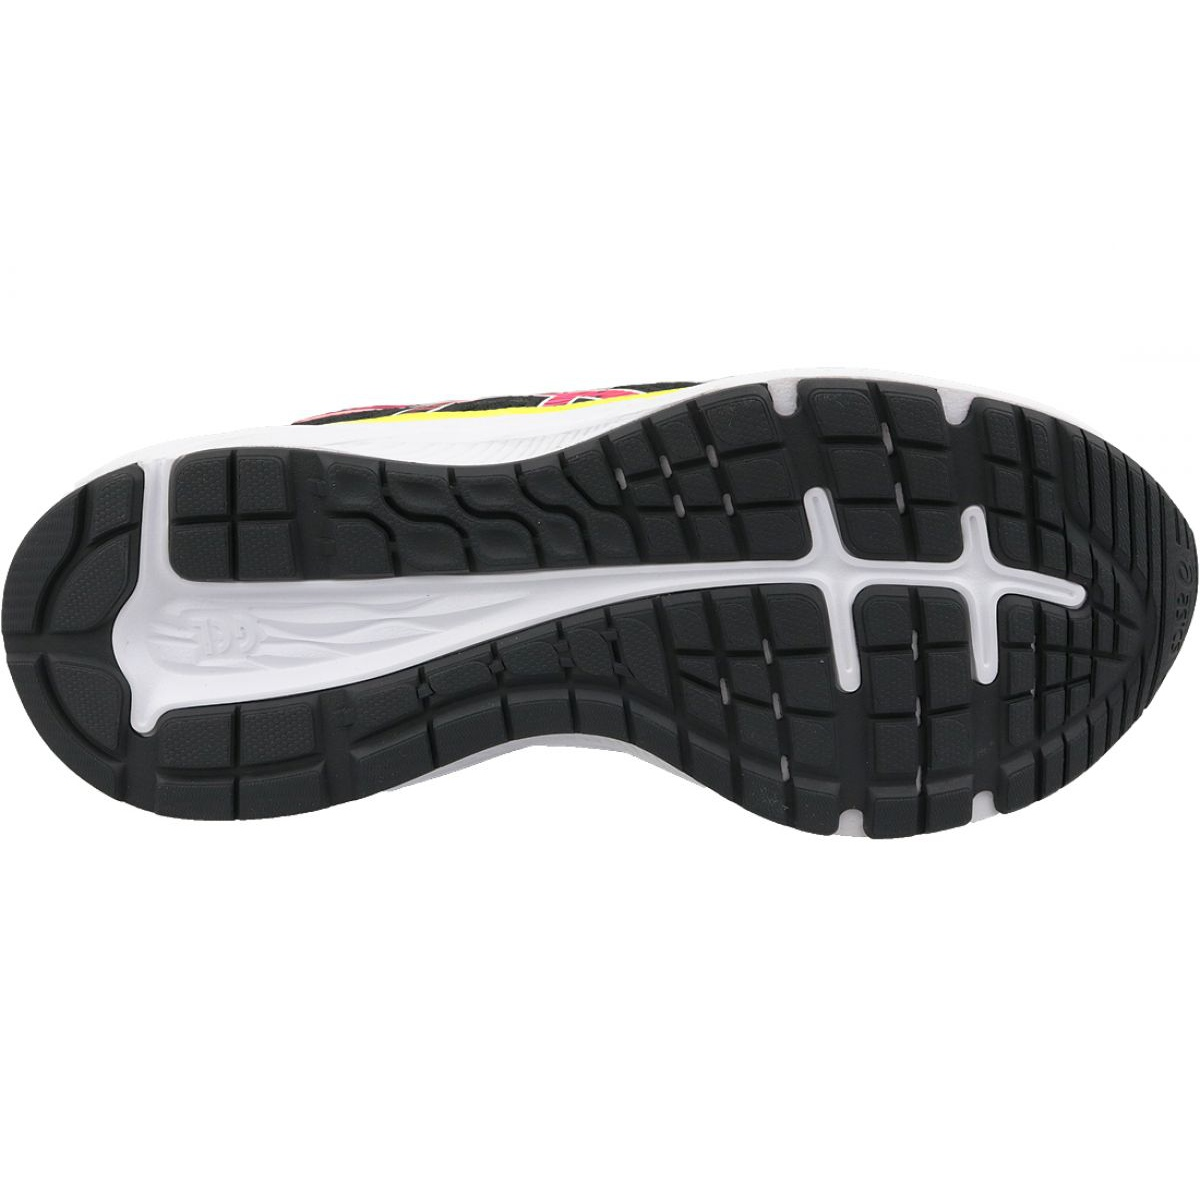 Fekete Futócipő Asics Gel Excite 6 Gs Jr 1014A079 002